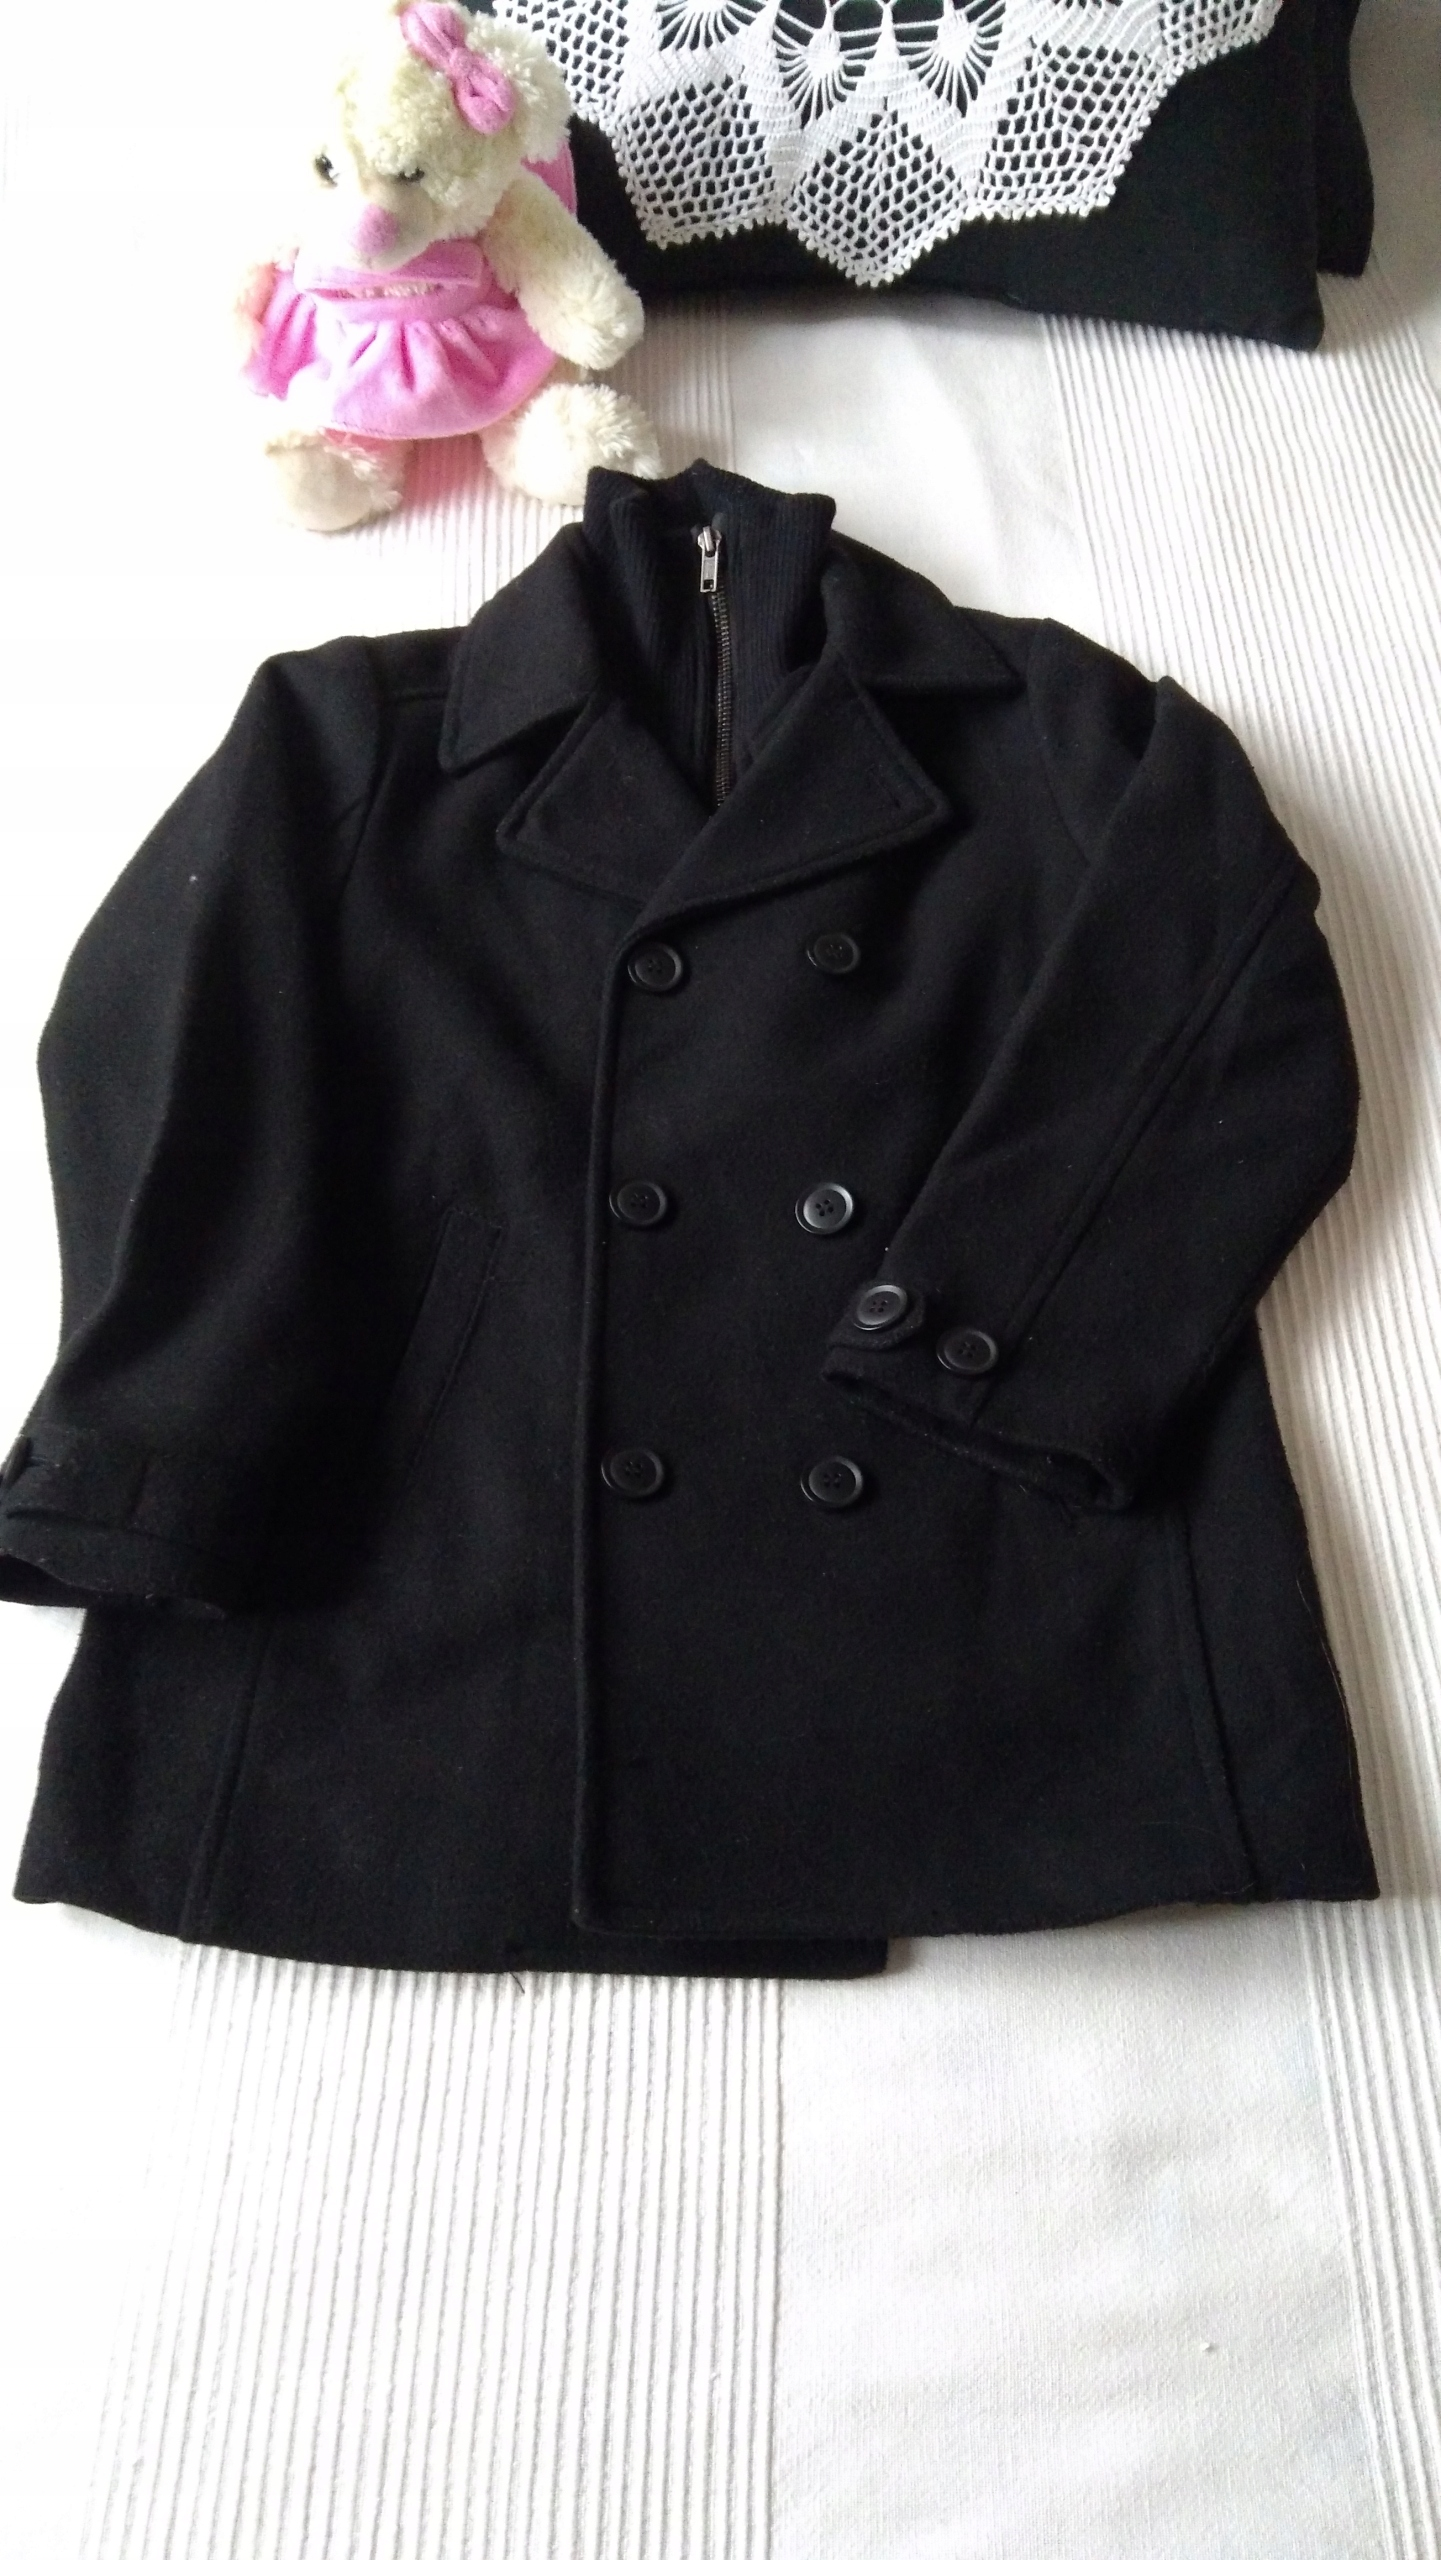 Ubranka dla chłopca 128-134